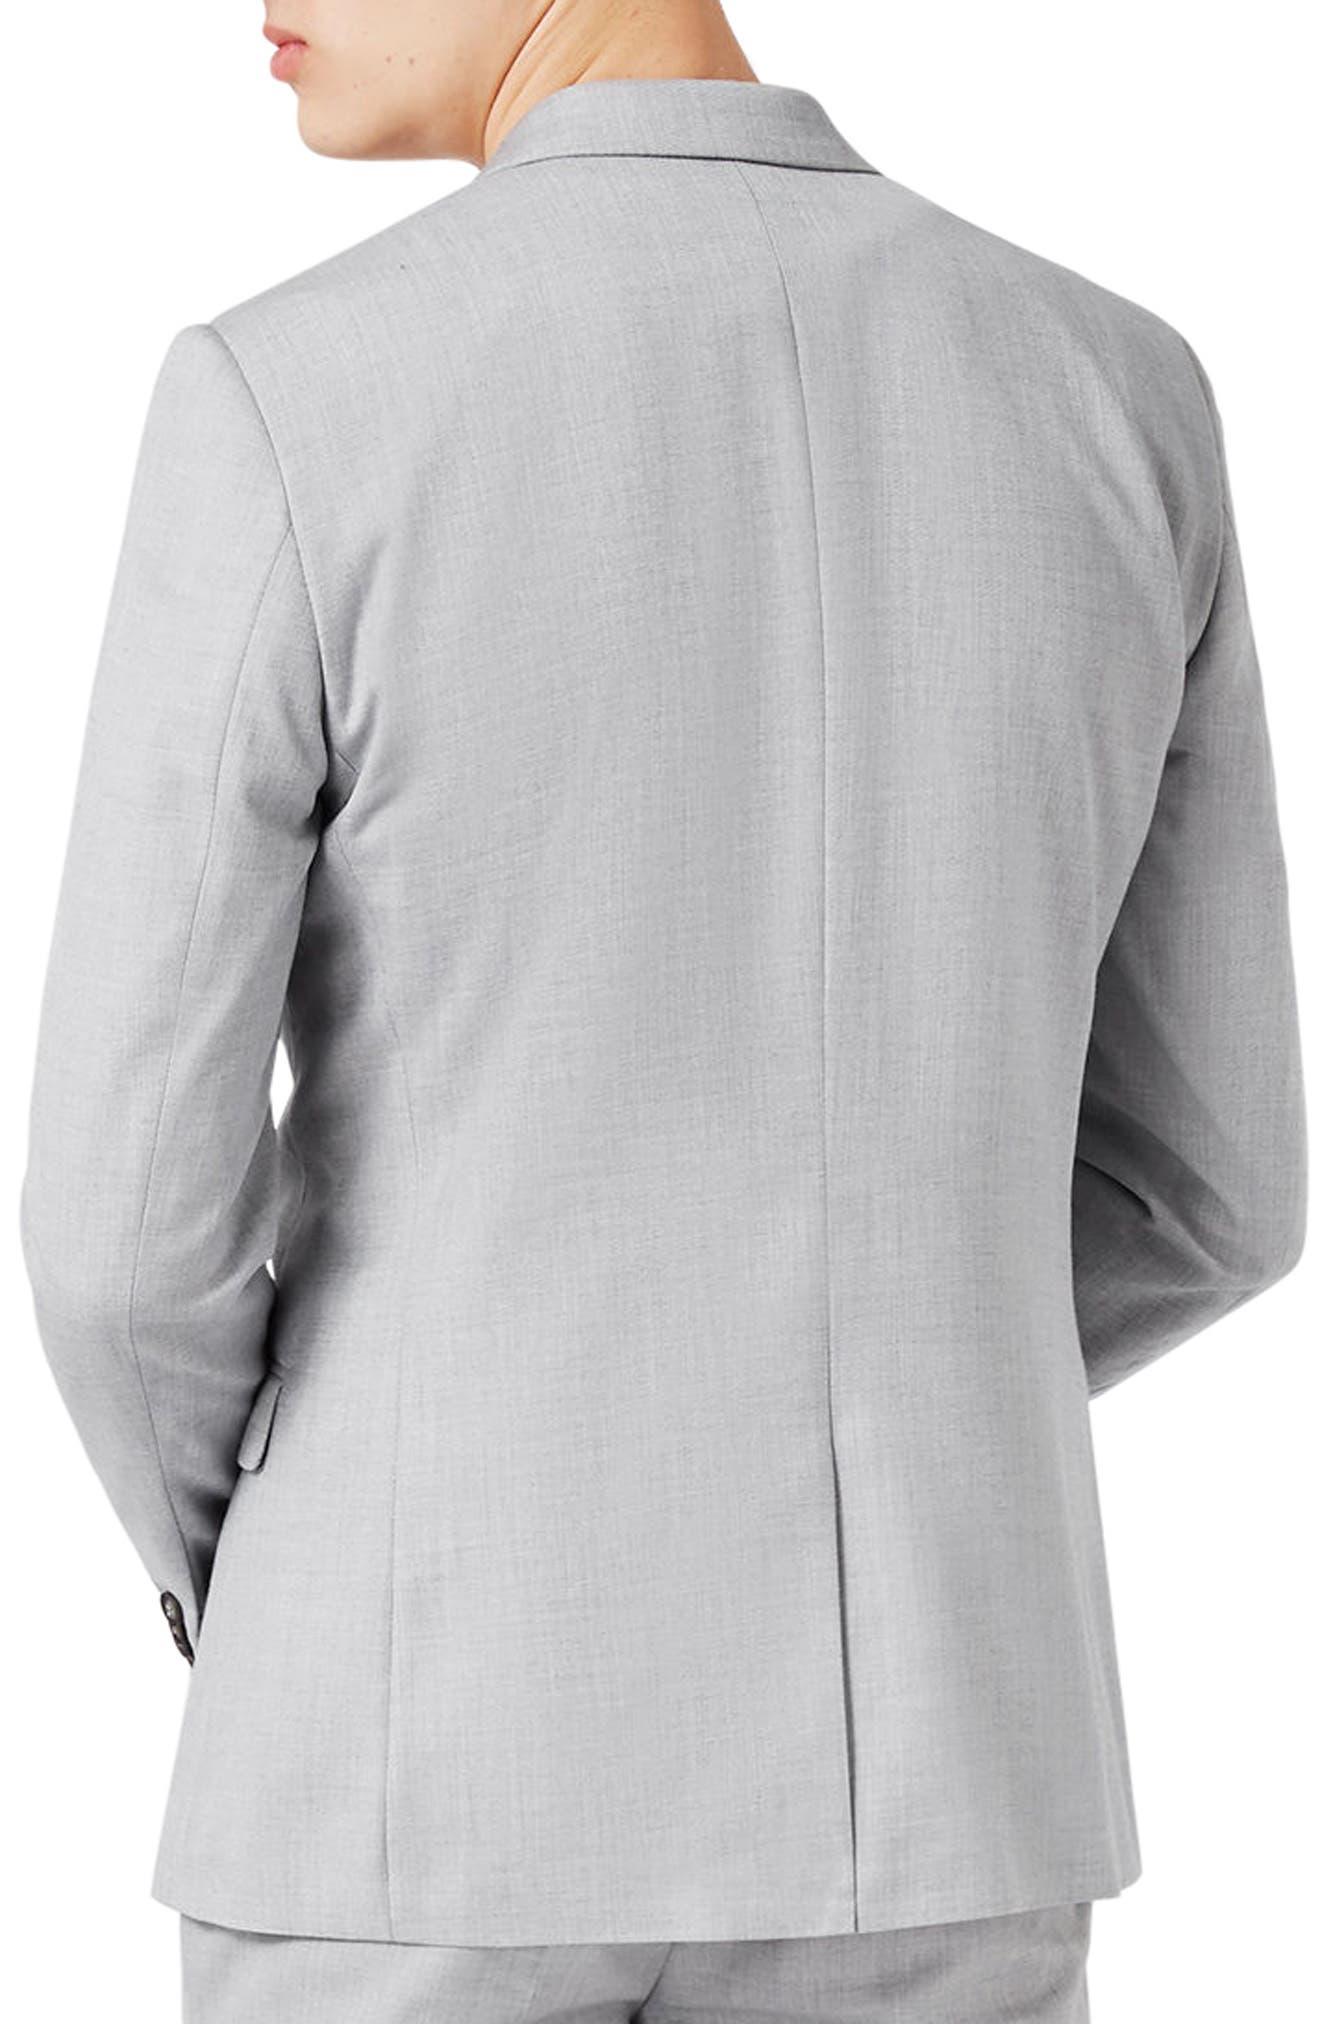 Skinny Fit Crosshatch Suit Jacket,                             Alternate thumbnail 3, color,                             Grey